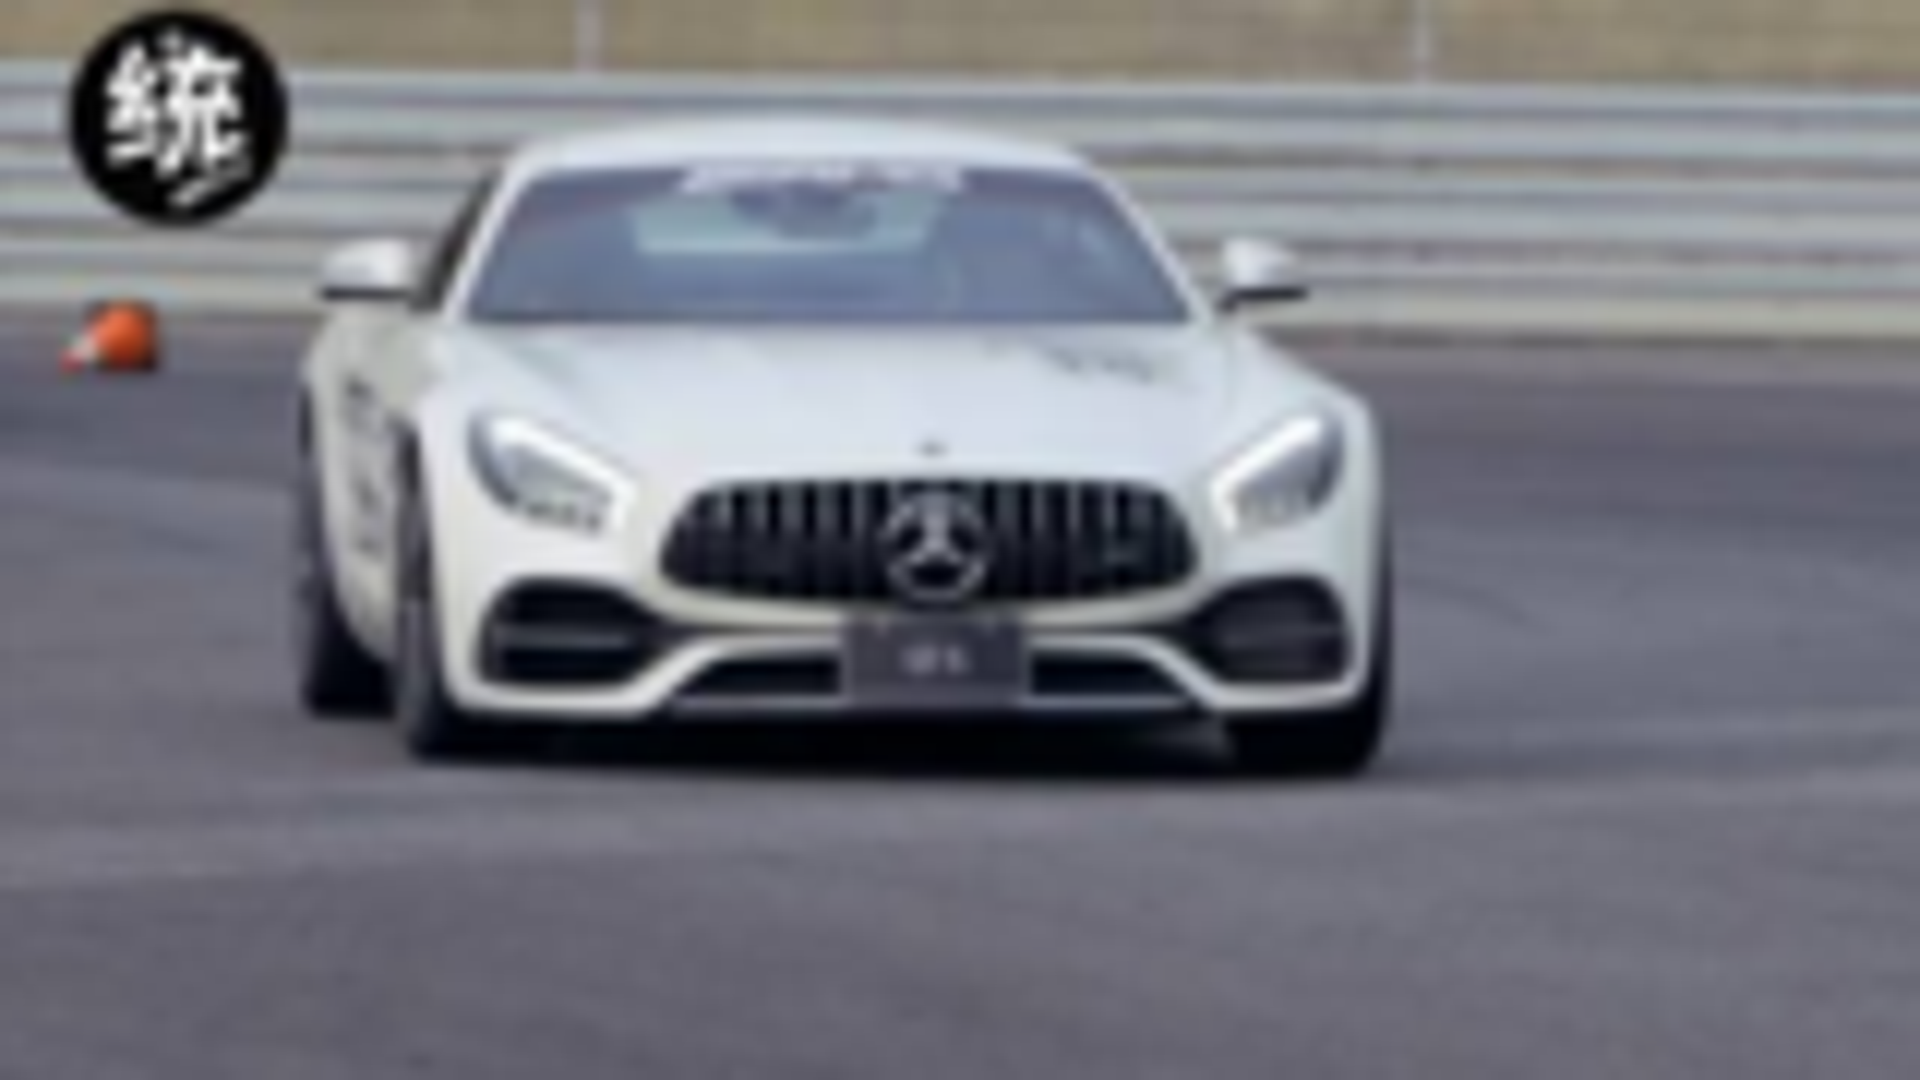 【统哥】AMG驾驶学院进阶再进化!AMG Driving Academy